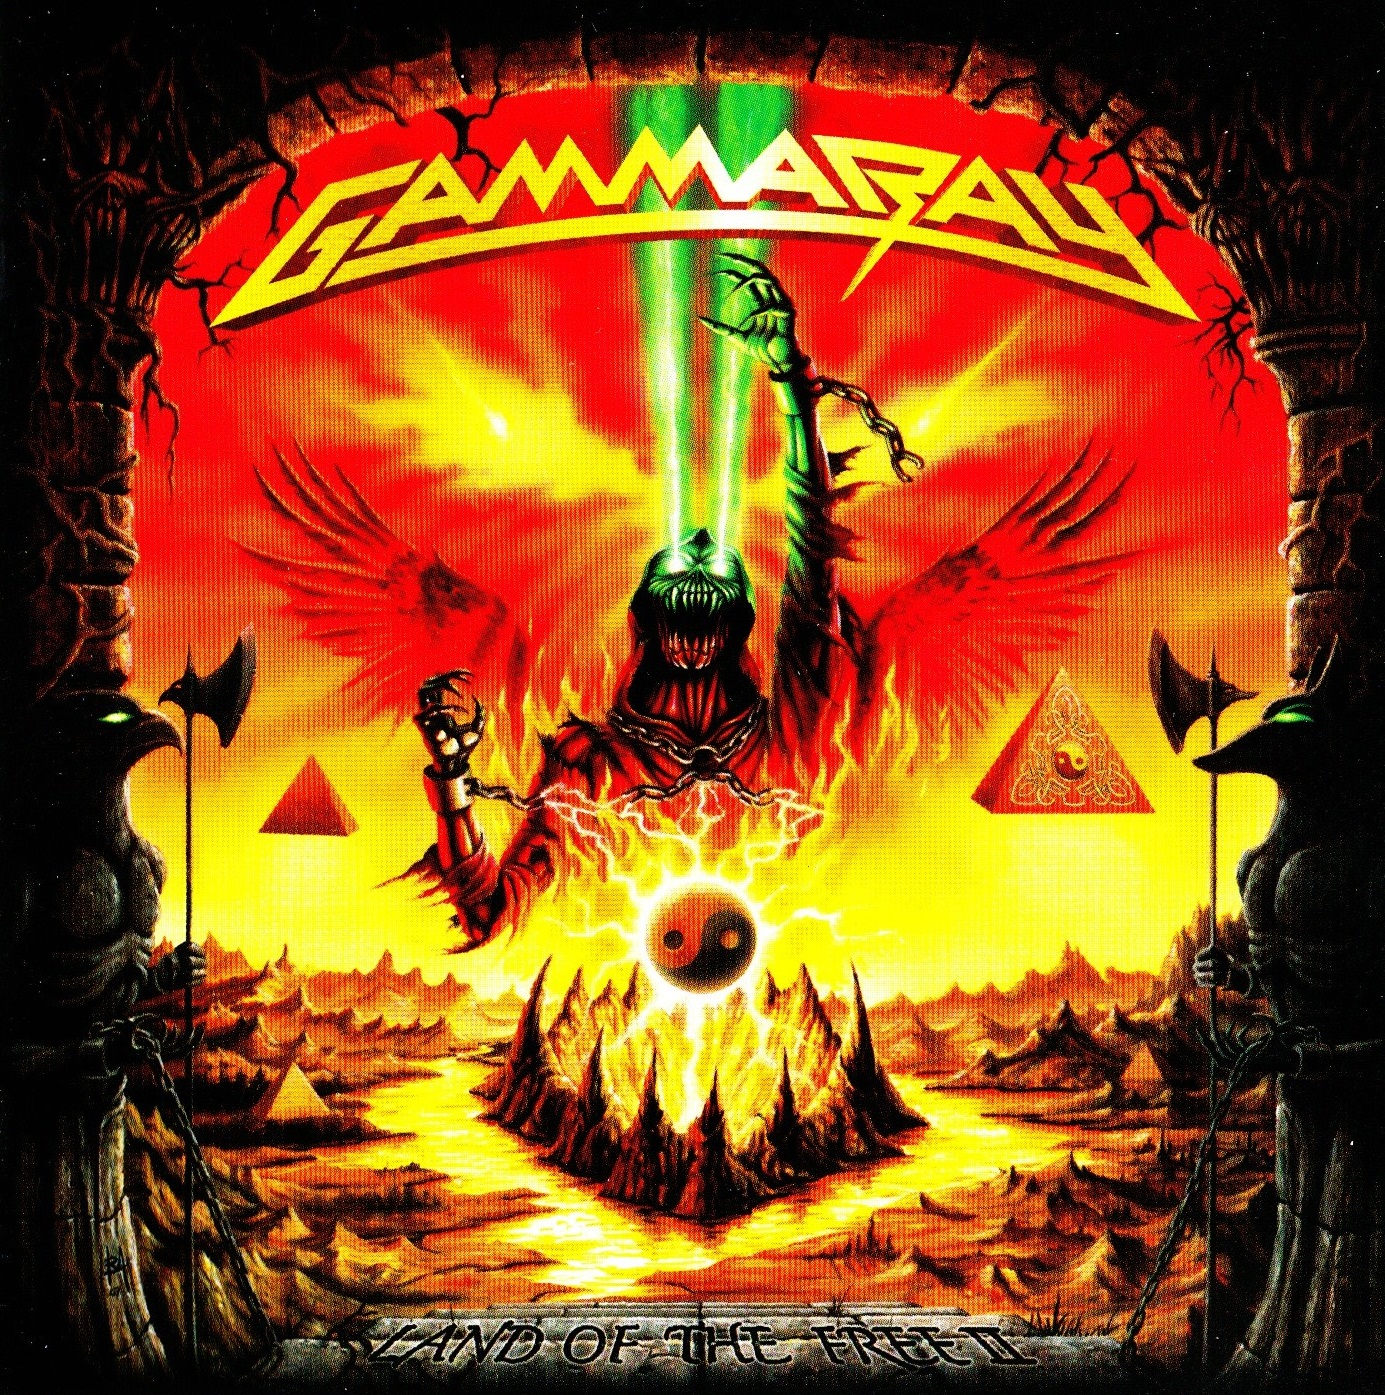 Gamma Ray — Land of the Free II (2007)